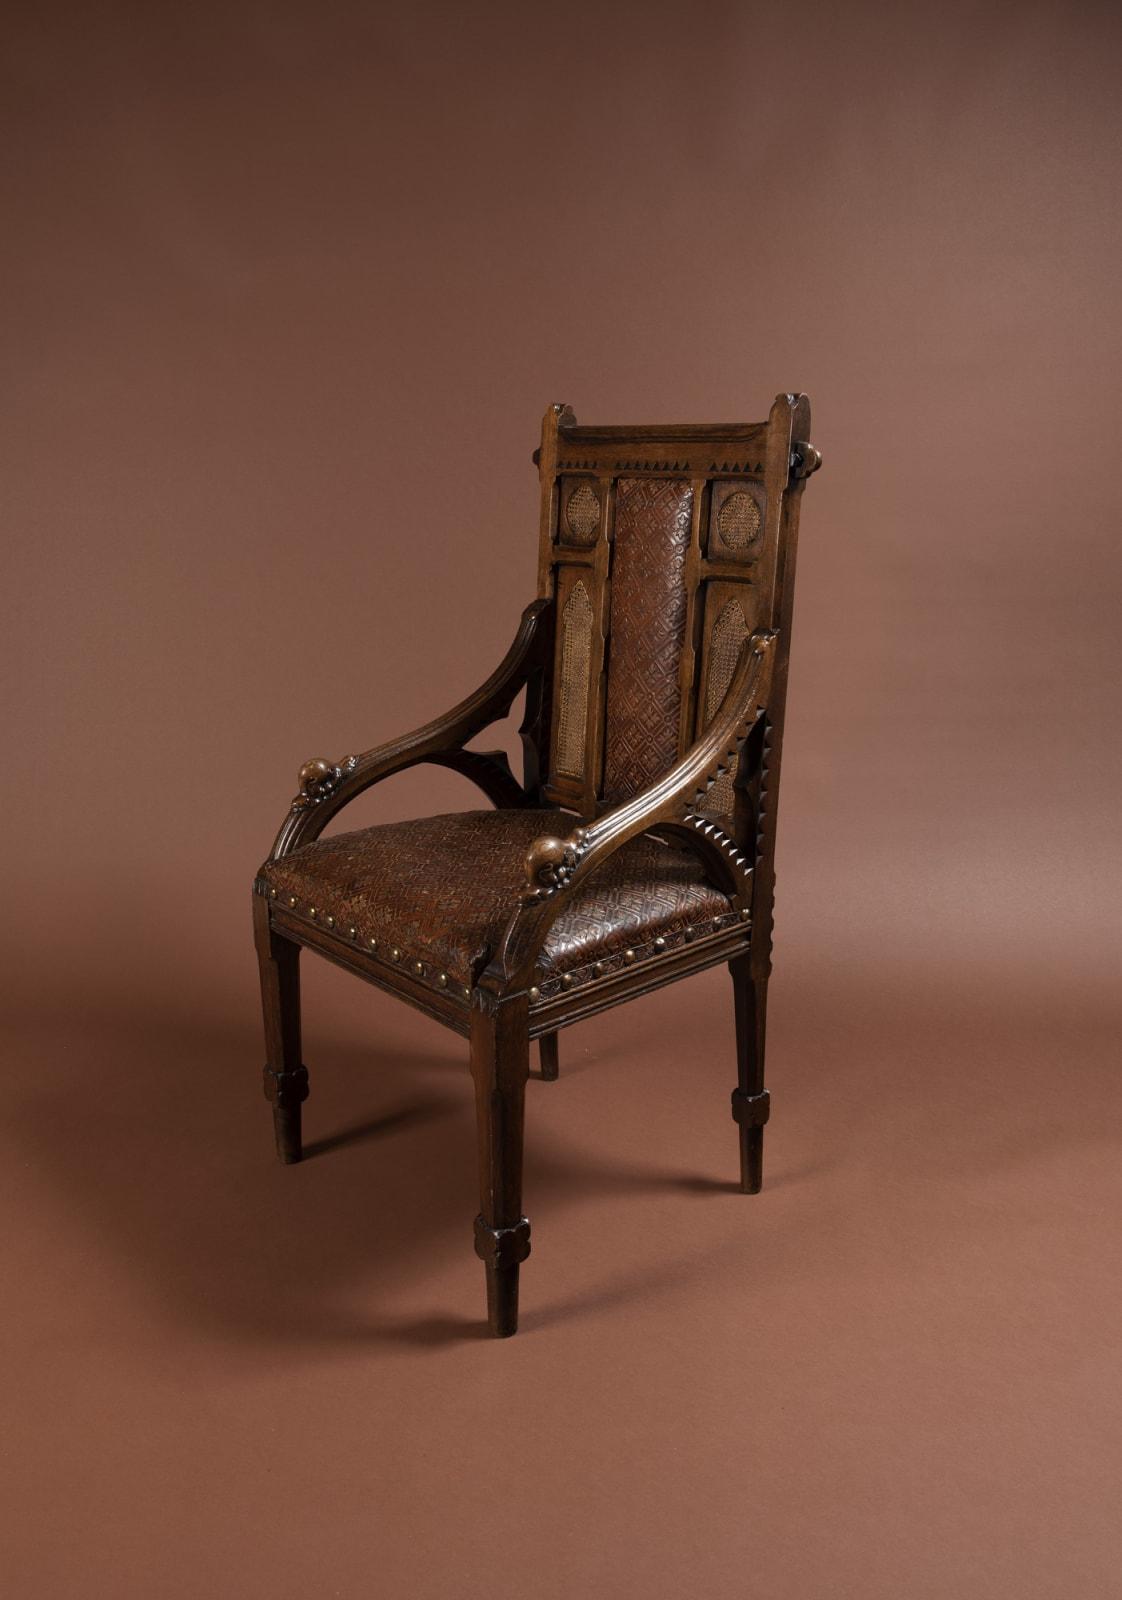 John Pollard Seddon, Gothic armchair, c.1860